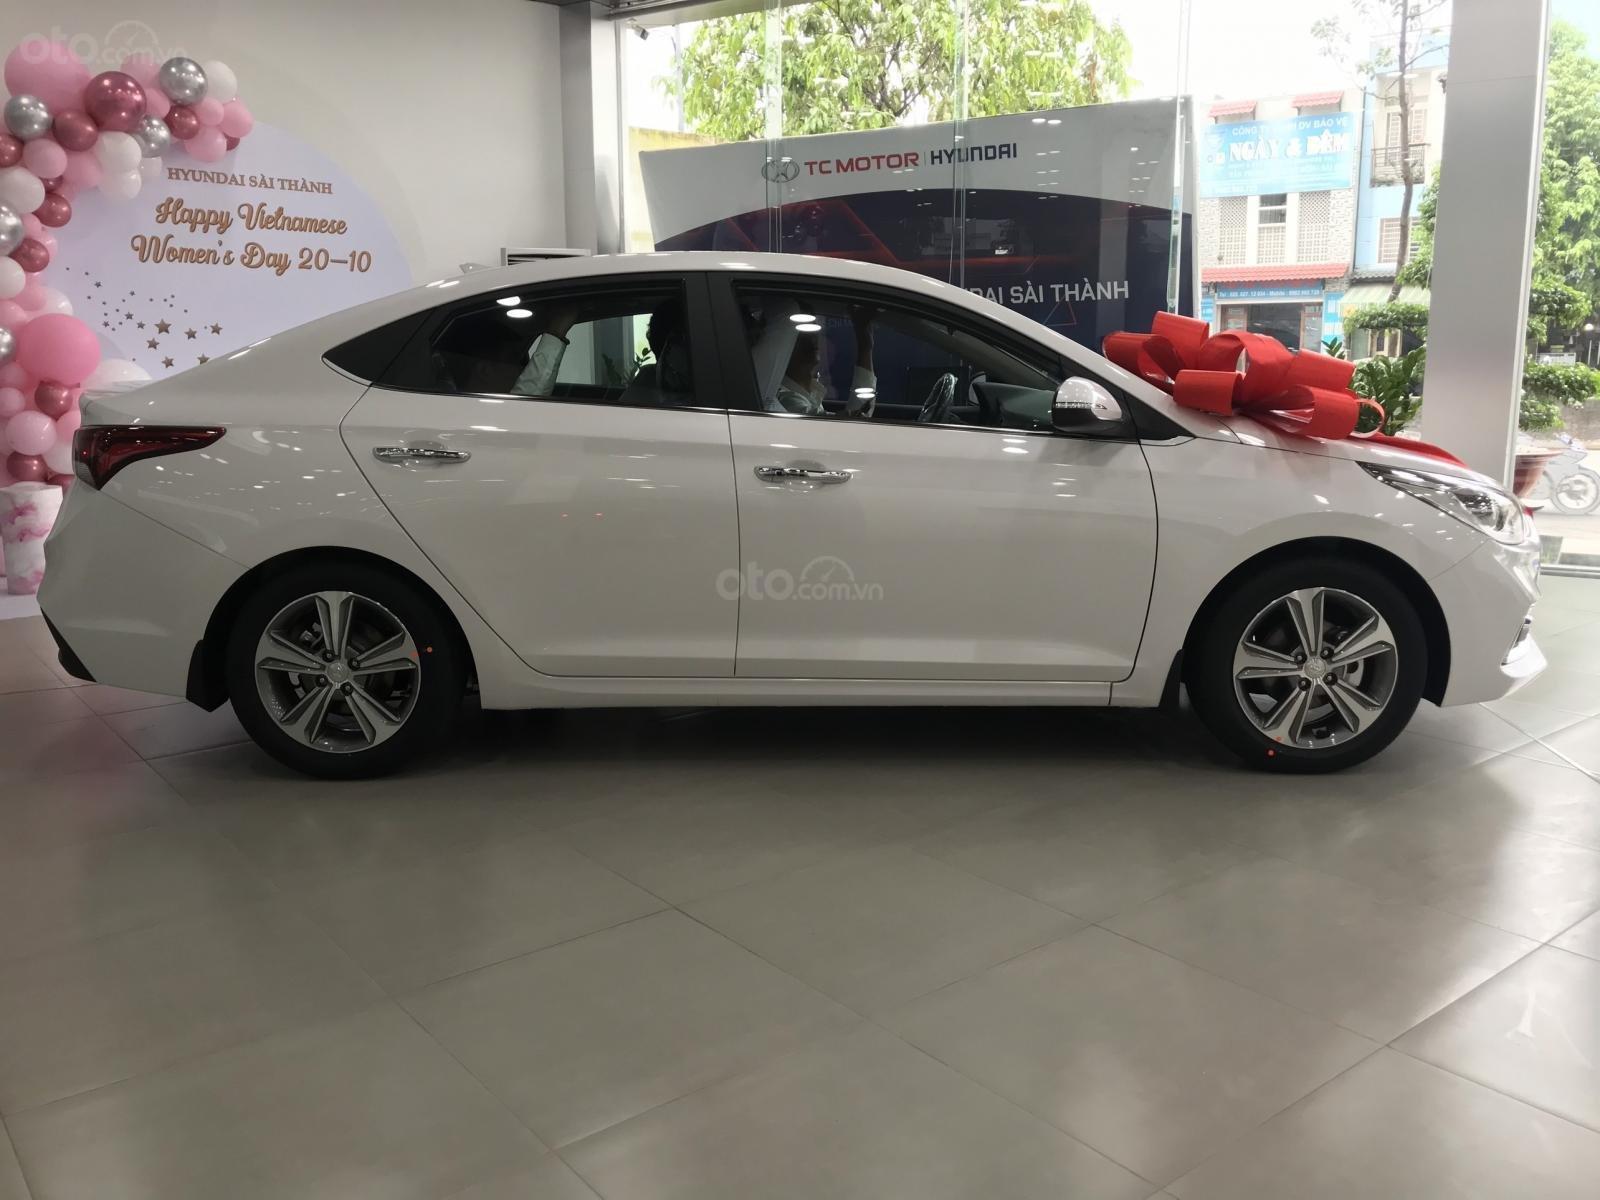 Hyundai Accent AT, AT đặc biệt 2020 sẵn xe giao ngay (2)